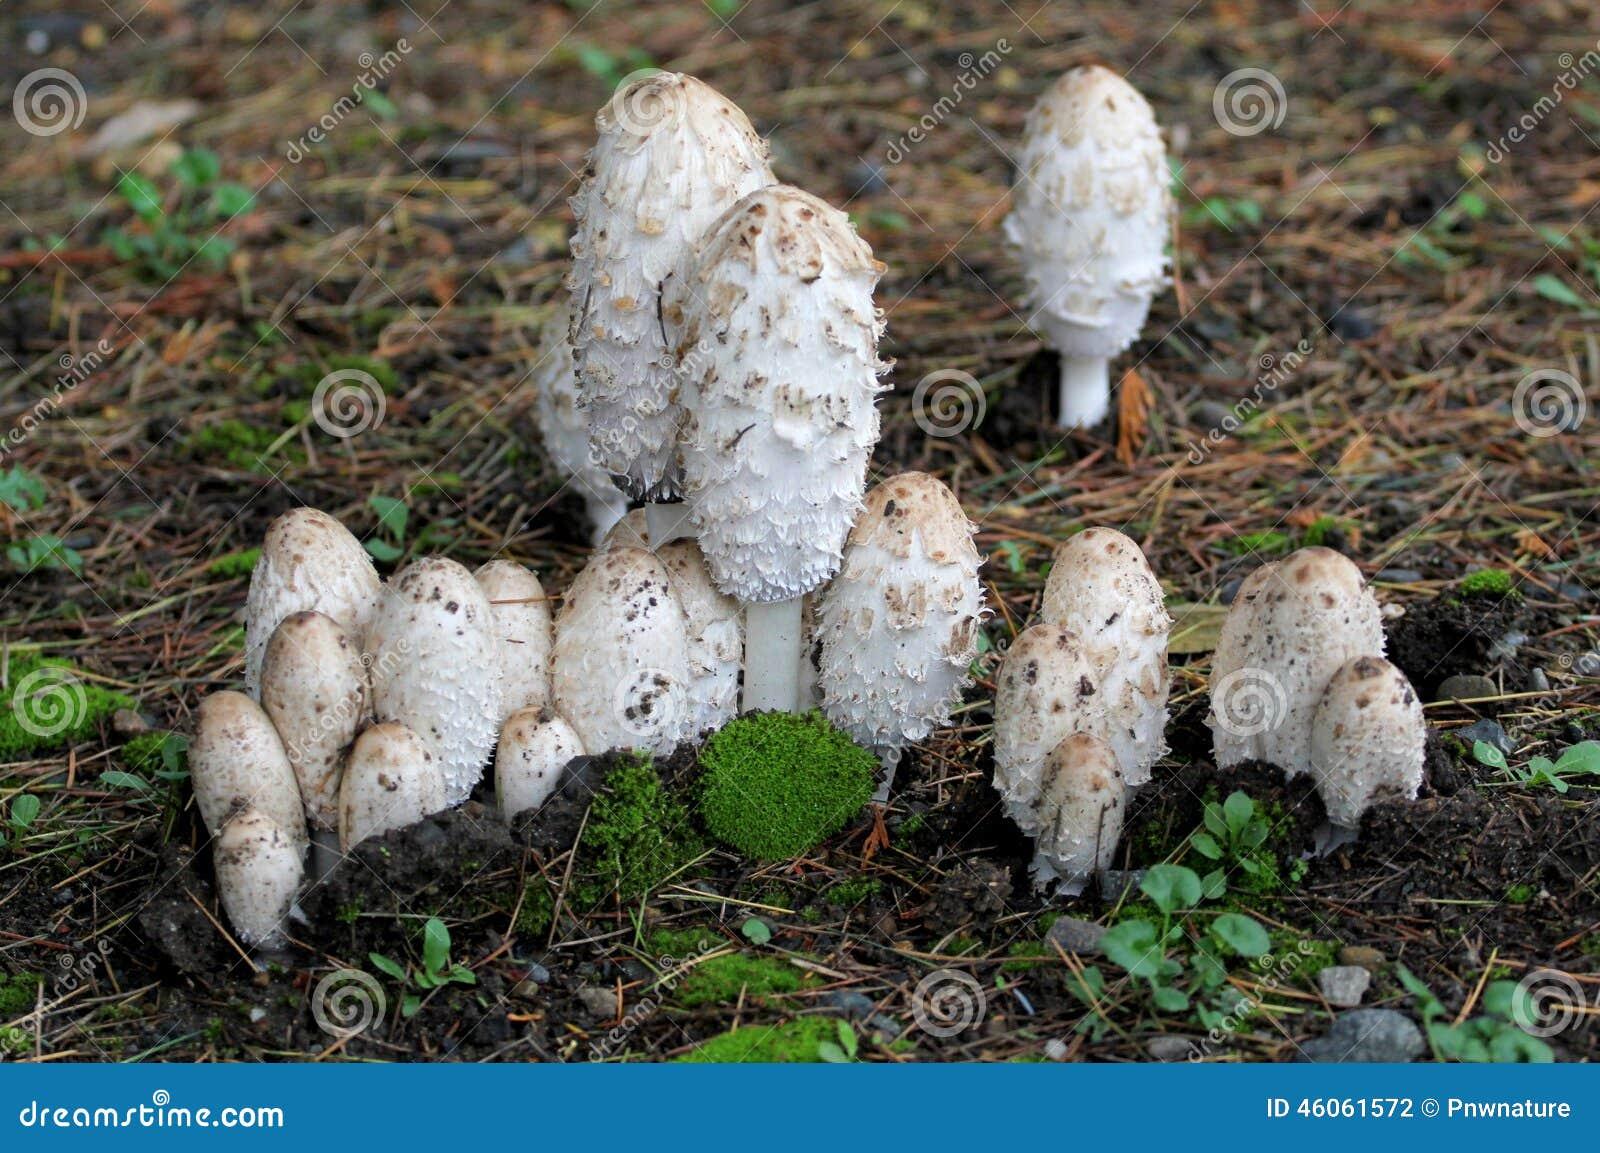 Shaggy Mane Mushrooms - Coprinus Comatus